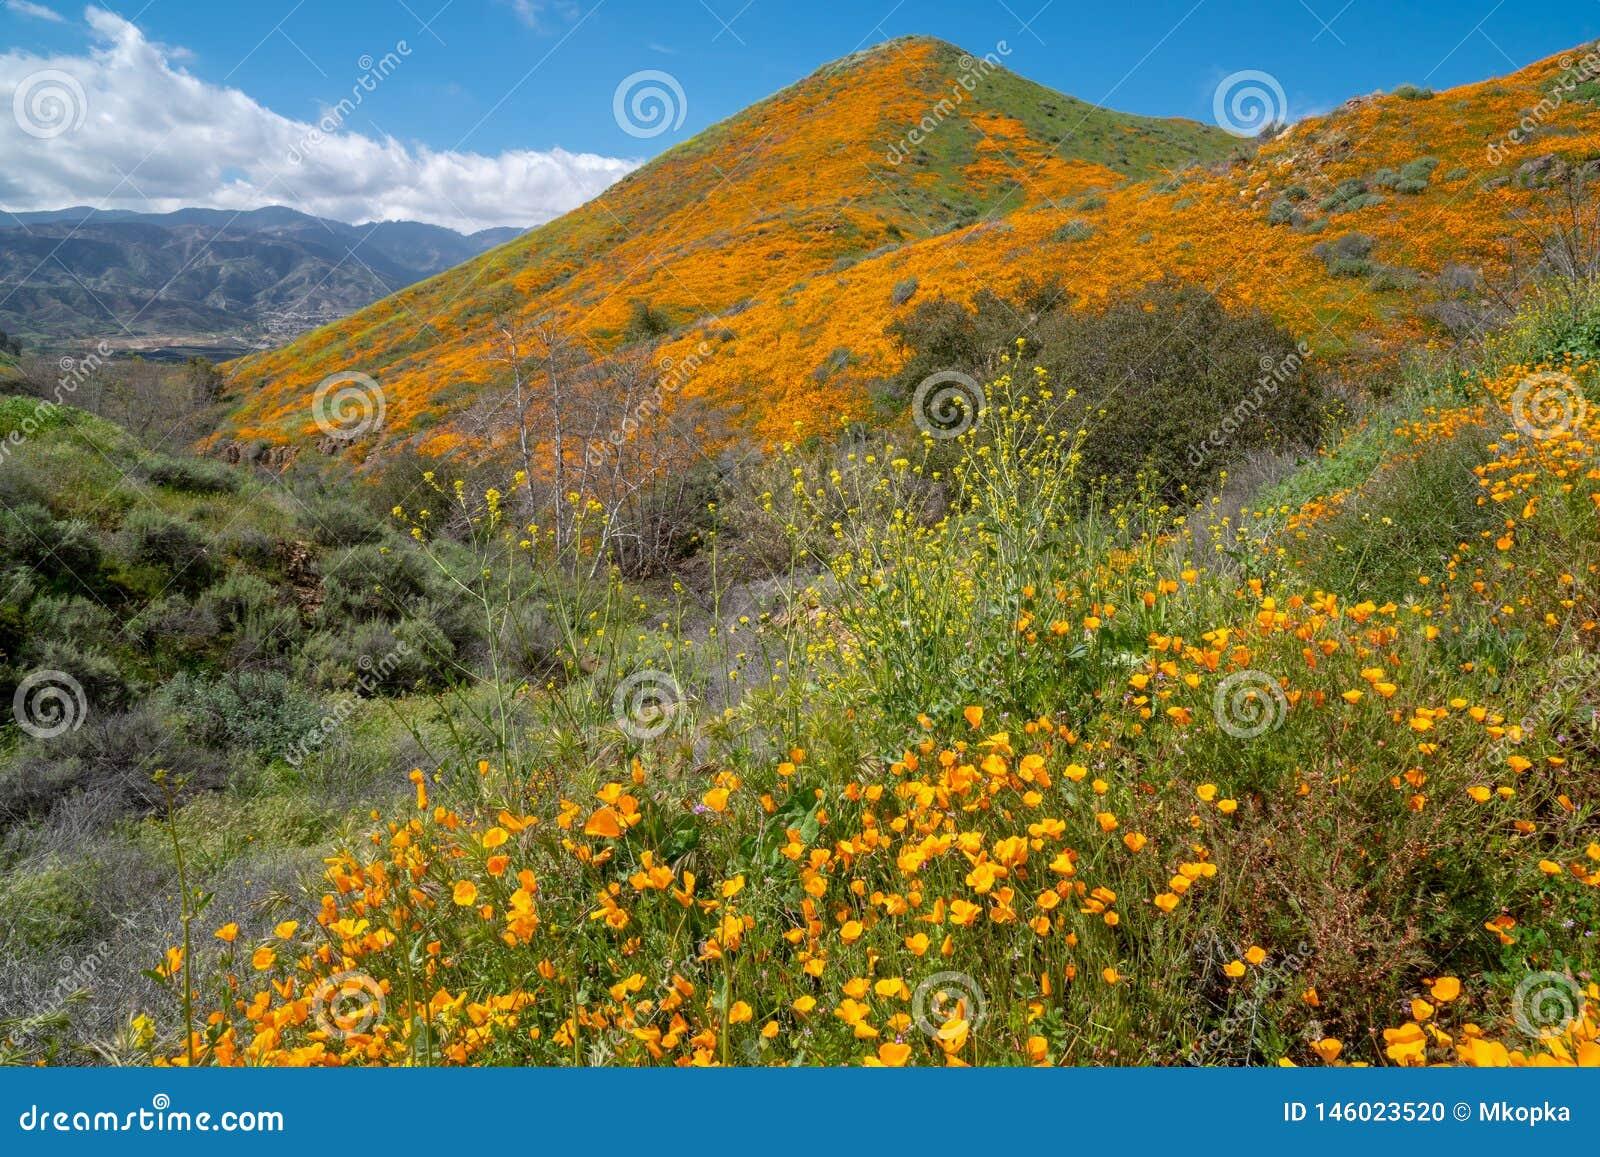 Walker Canyon no lago Elsinore Califórnia, coberta nos wildflowers